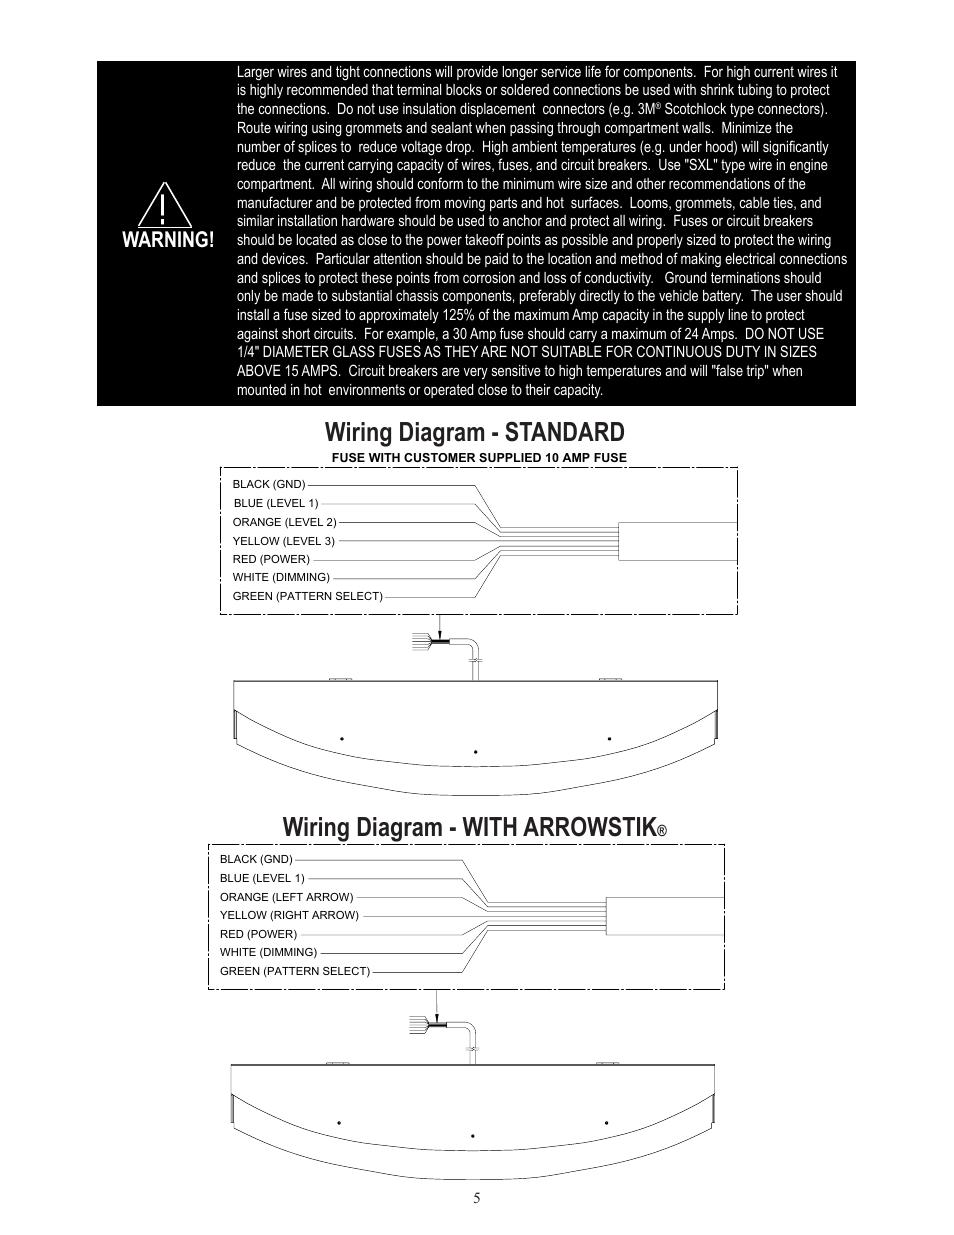 hight resolution of code 3 wingman wiring diagram wiring diagram detailed rh 3 13 5 gastspiel gerhartz de code 3 light bar parts code 3 light bar parts